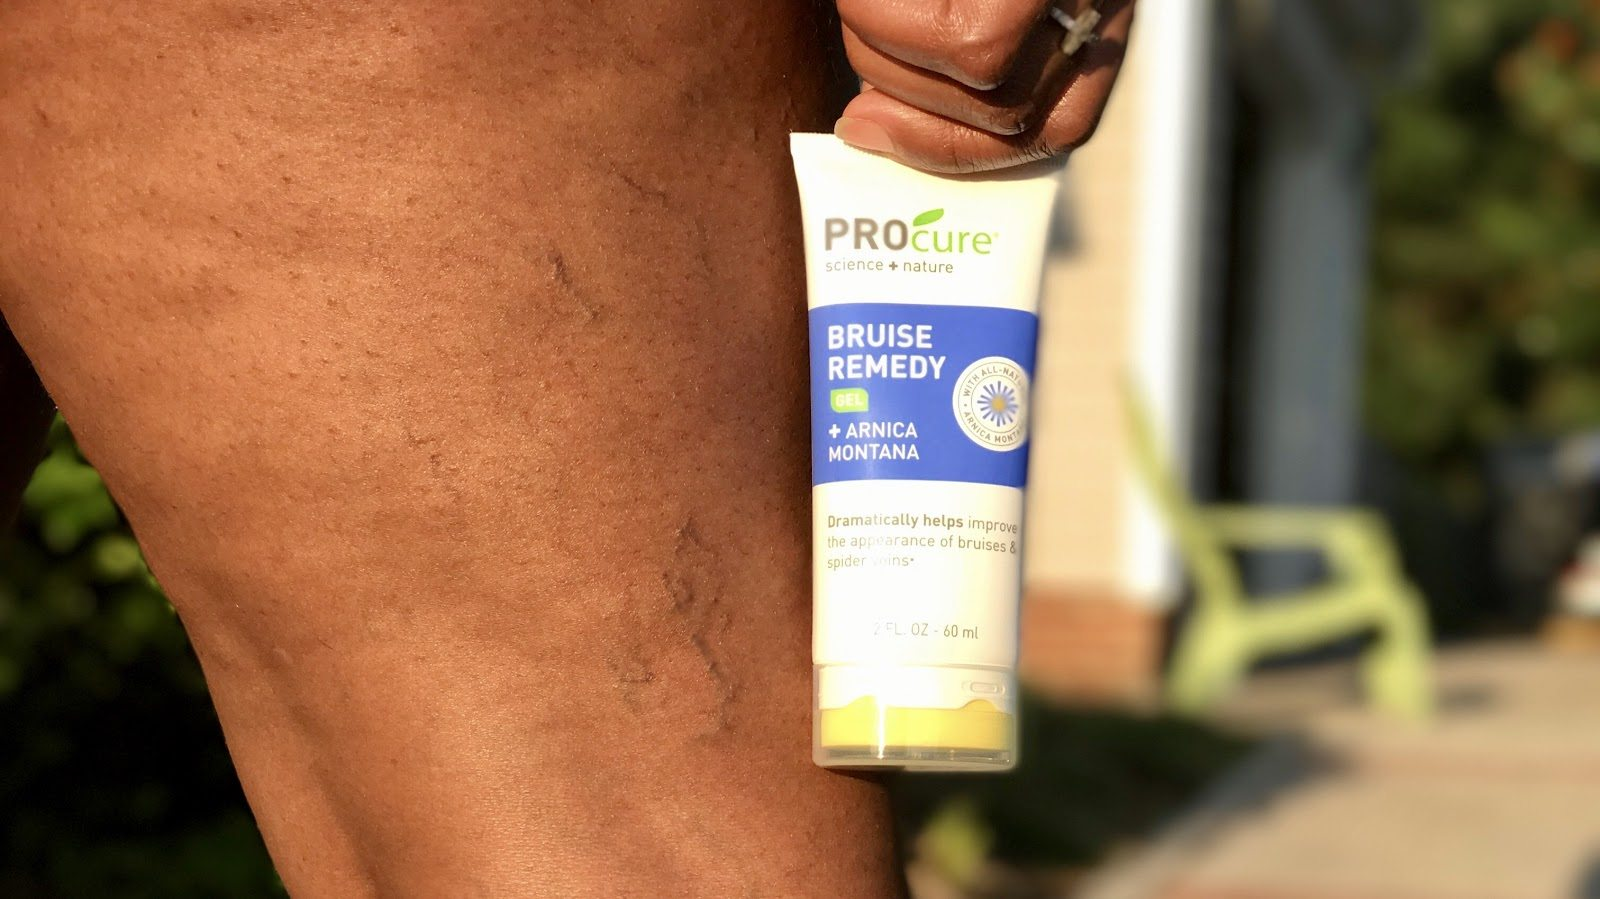 PROcure Bruise Remedy